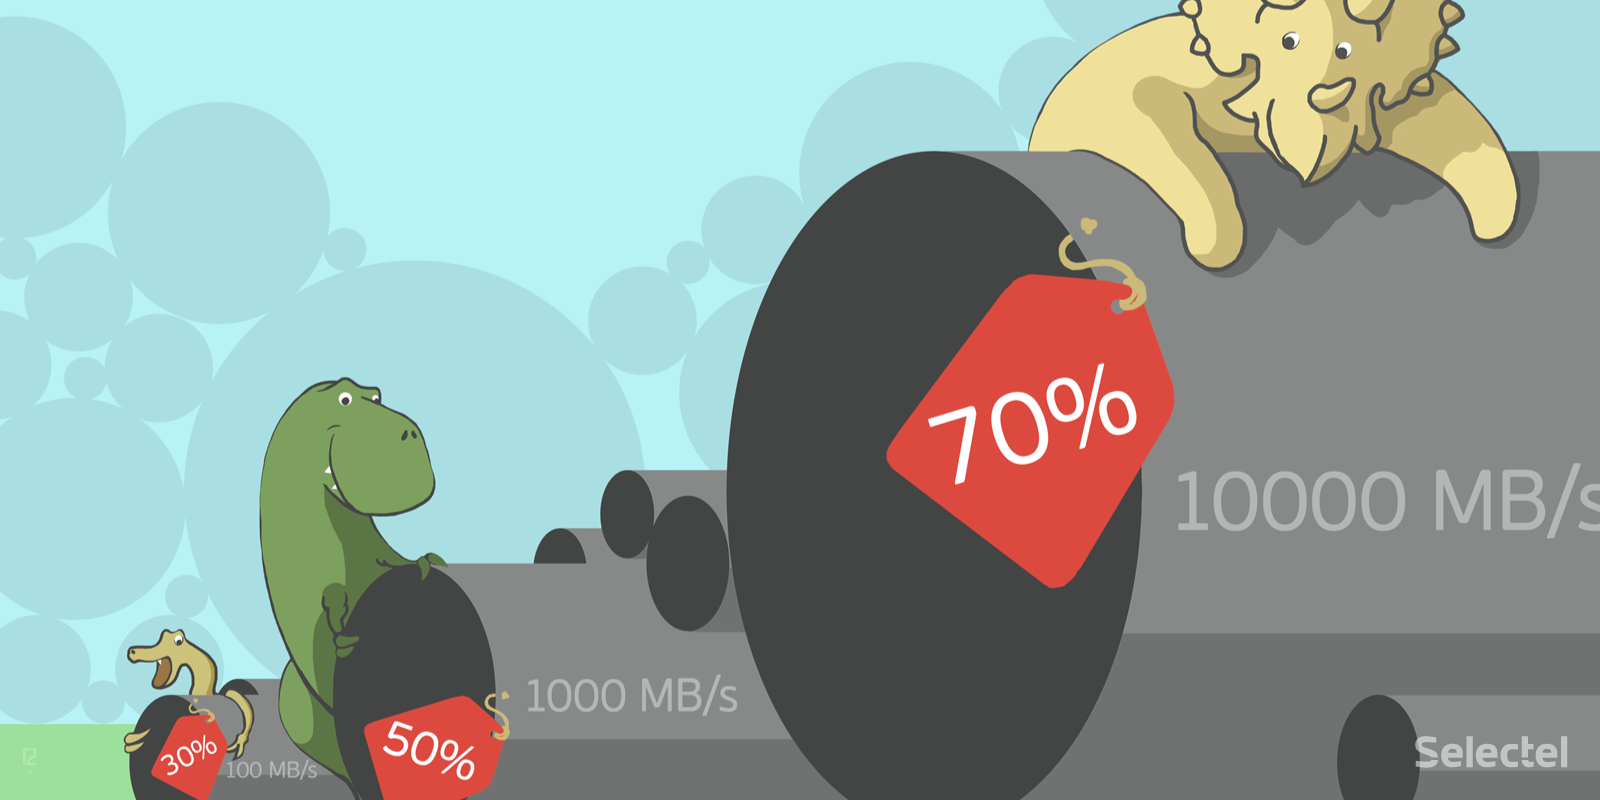 Канал 10 Гбит/с на 70% дешевле